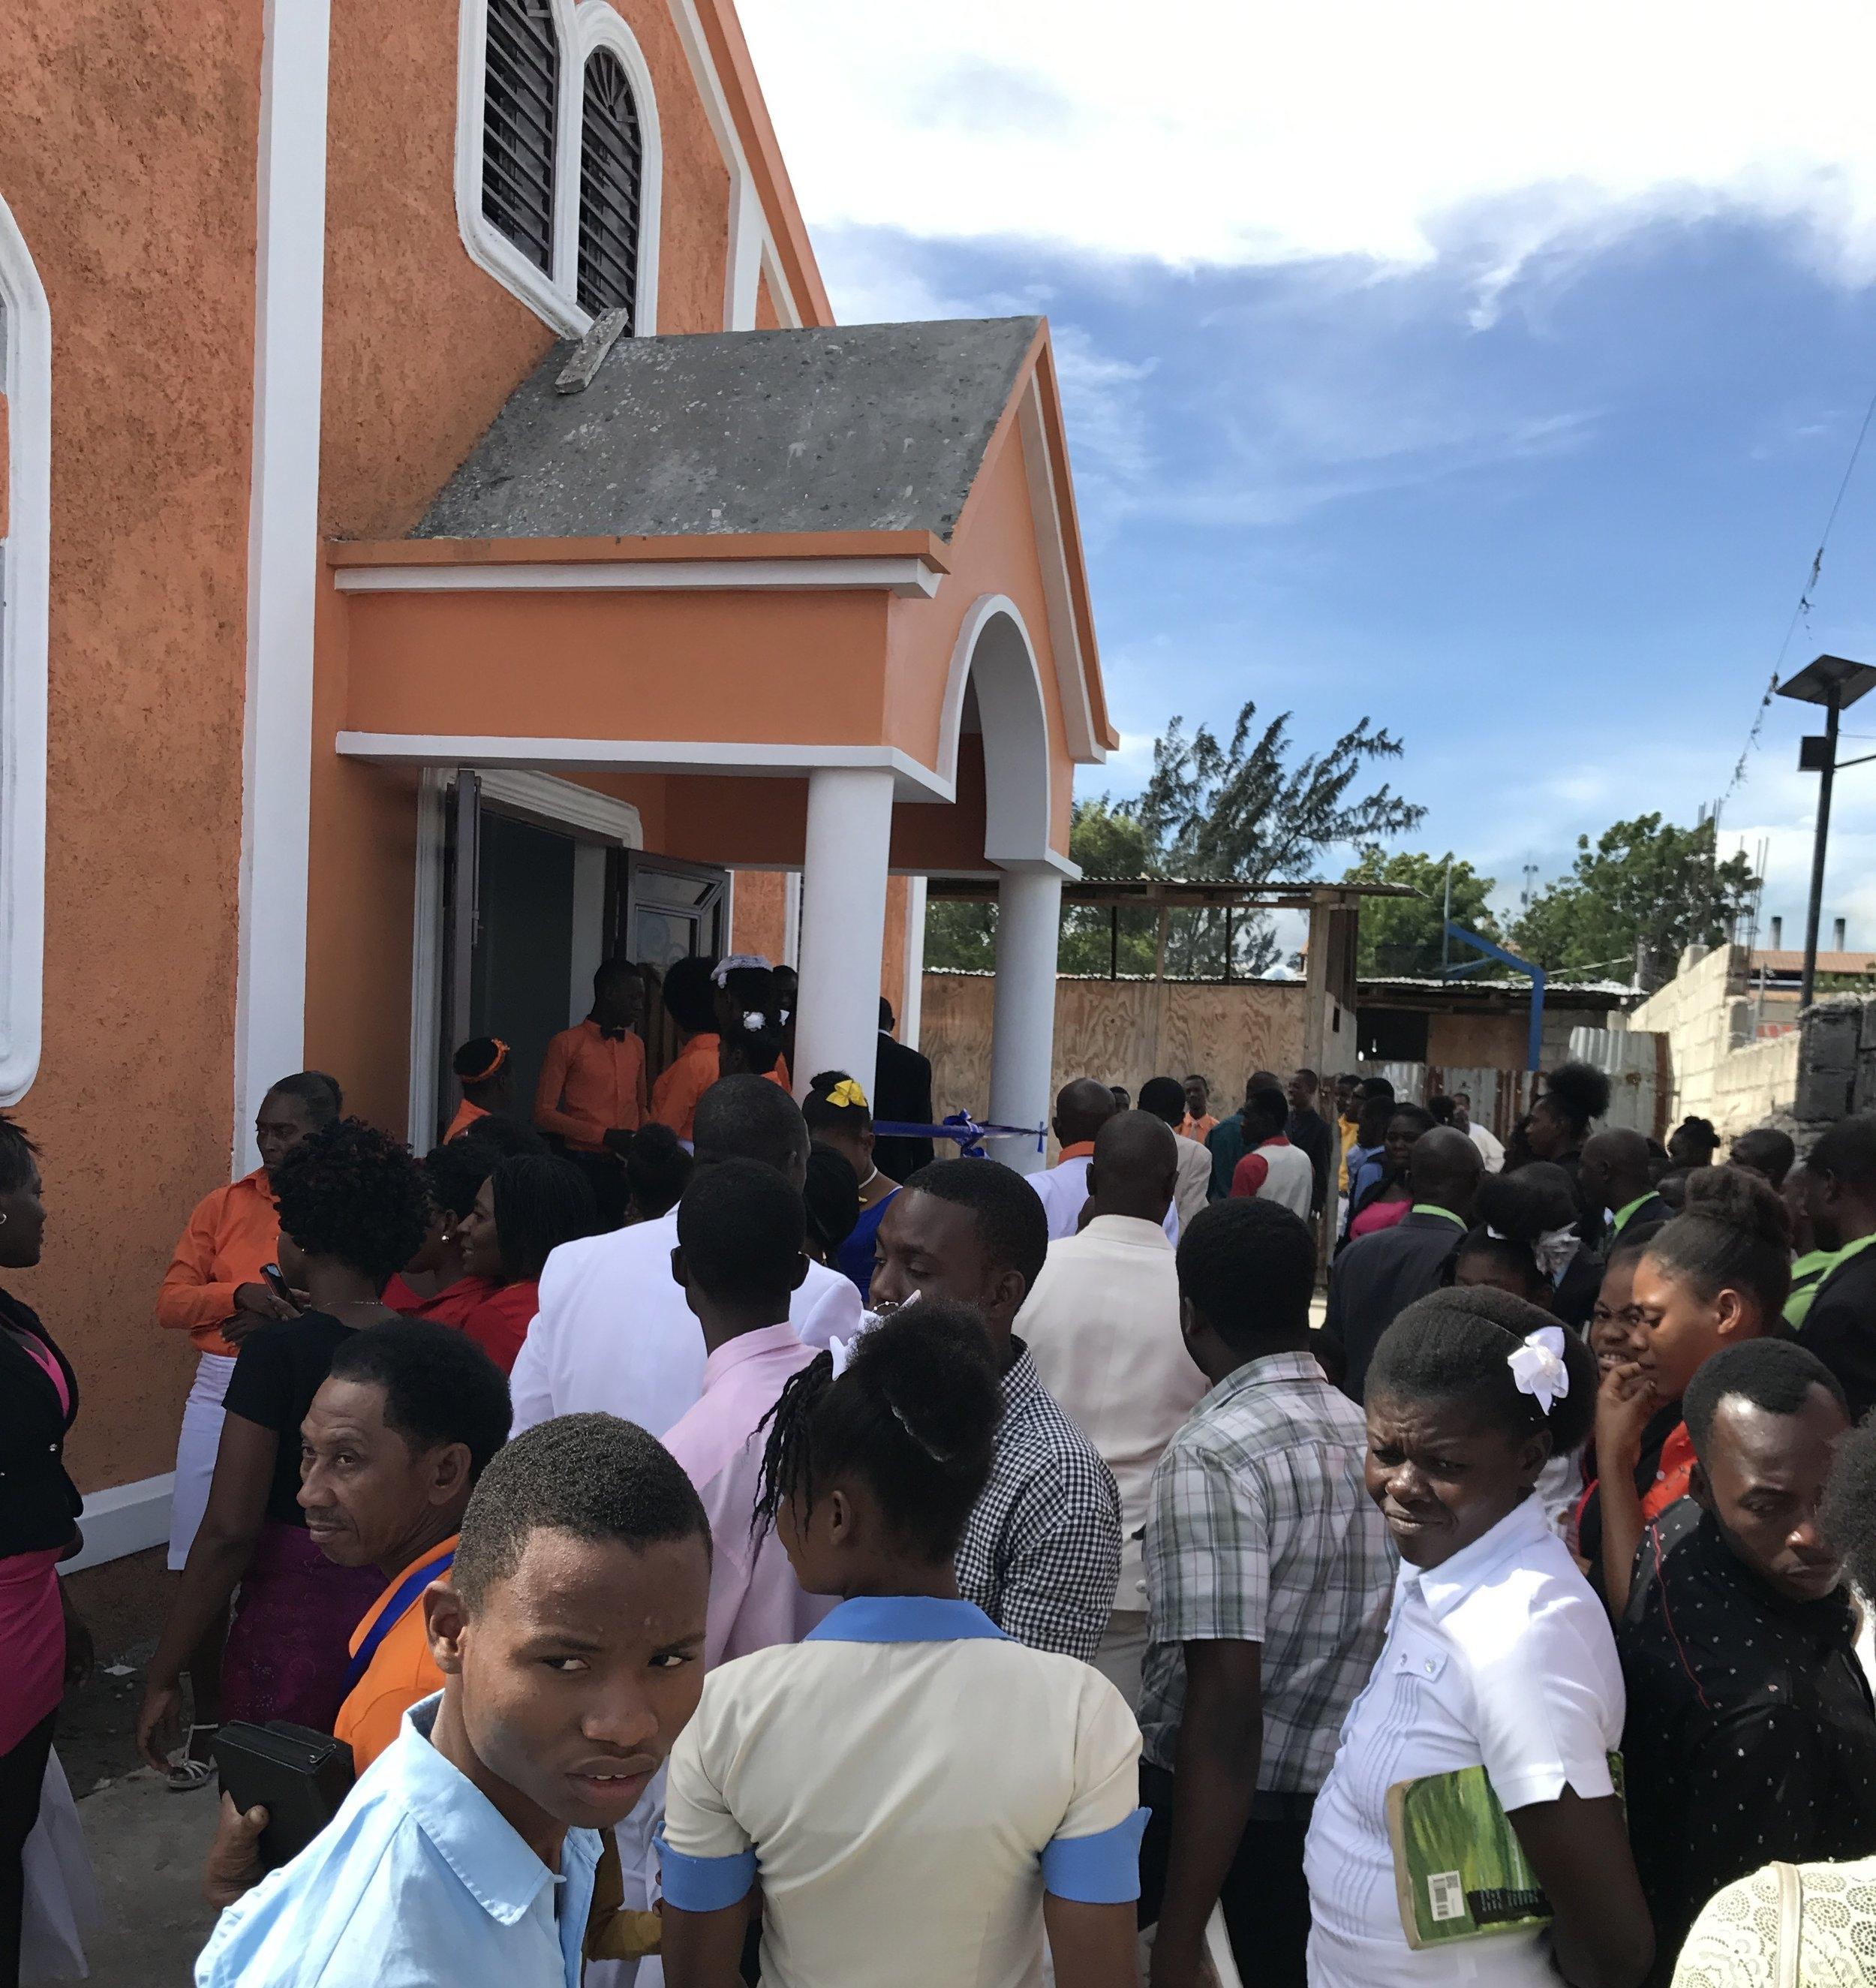 Church crowd.JPG